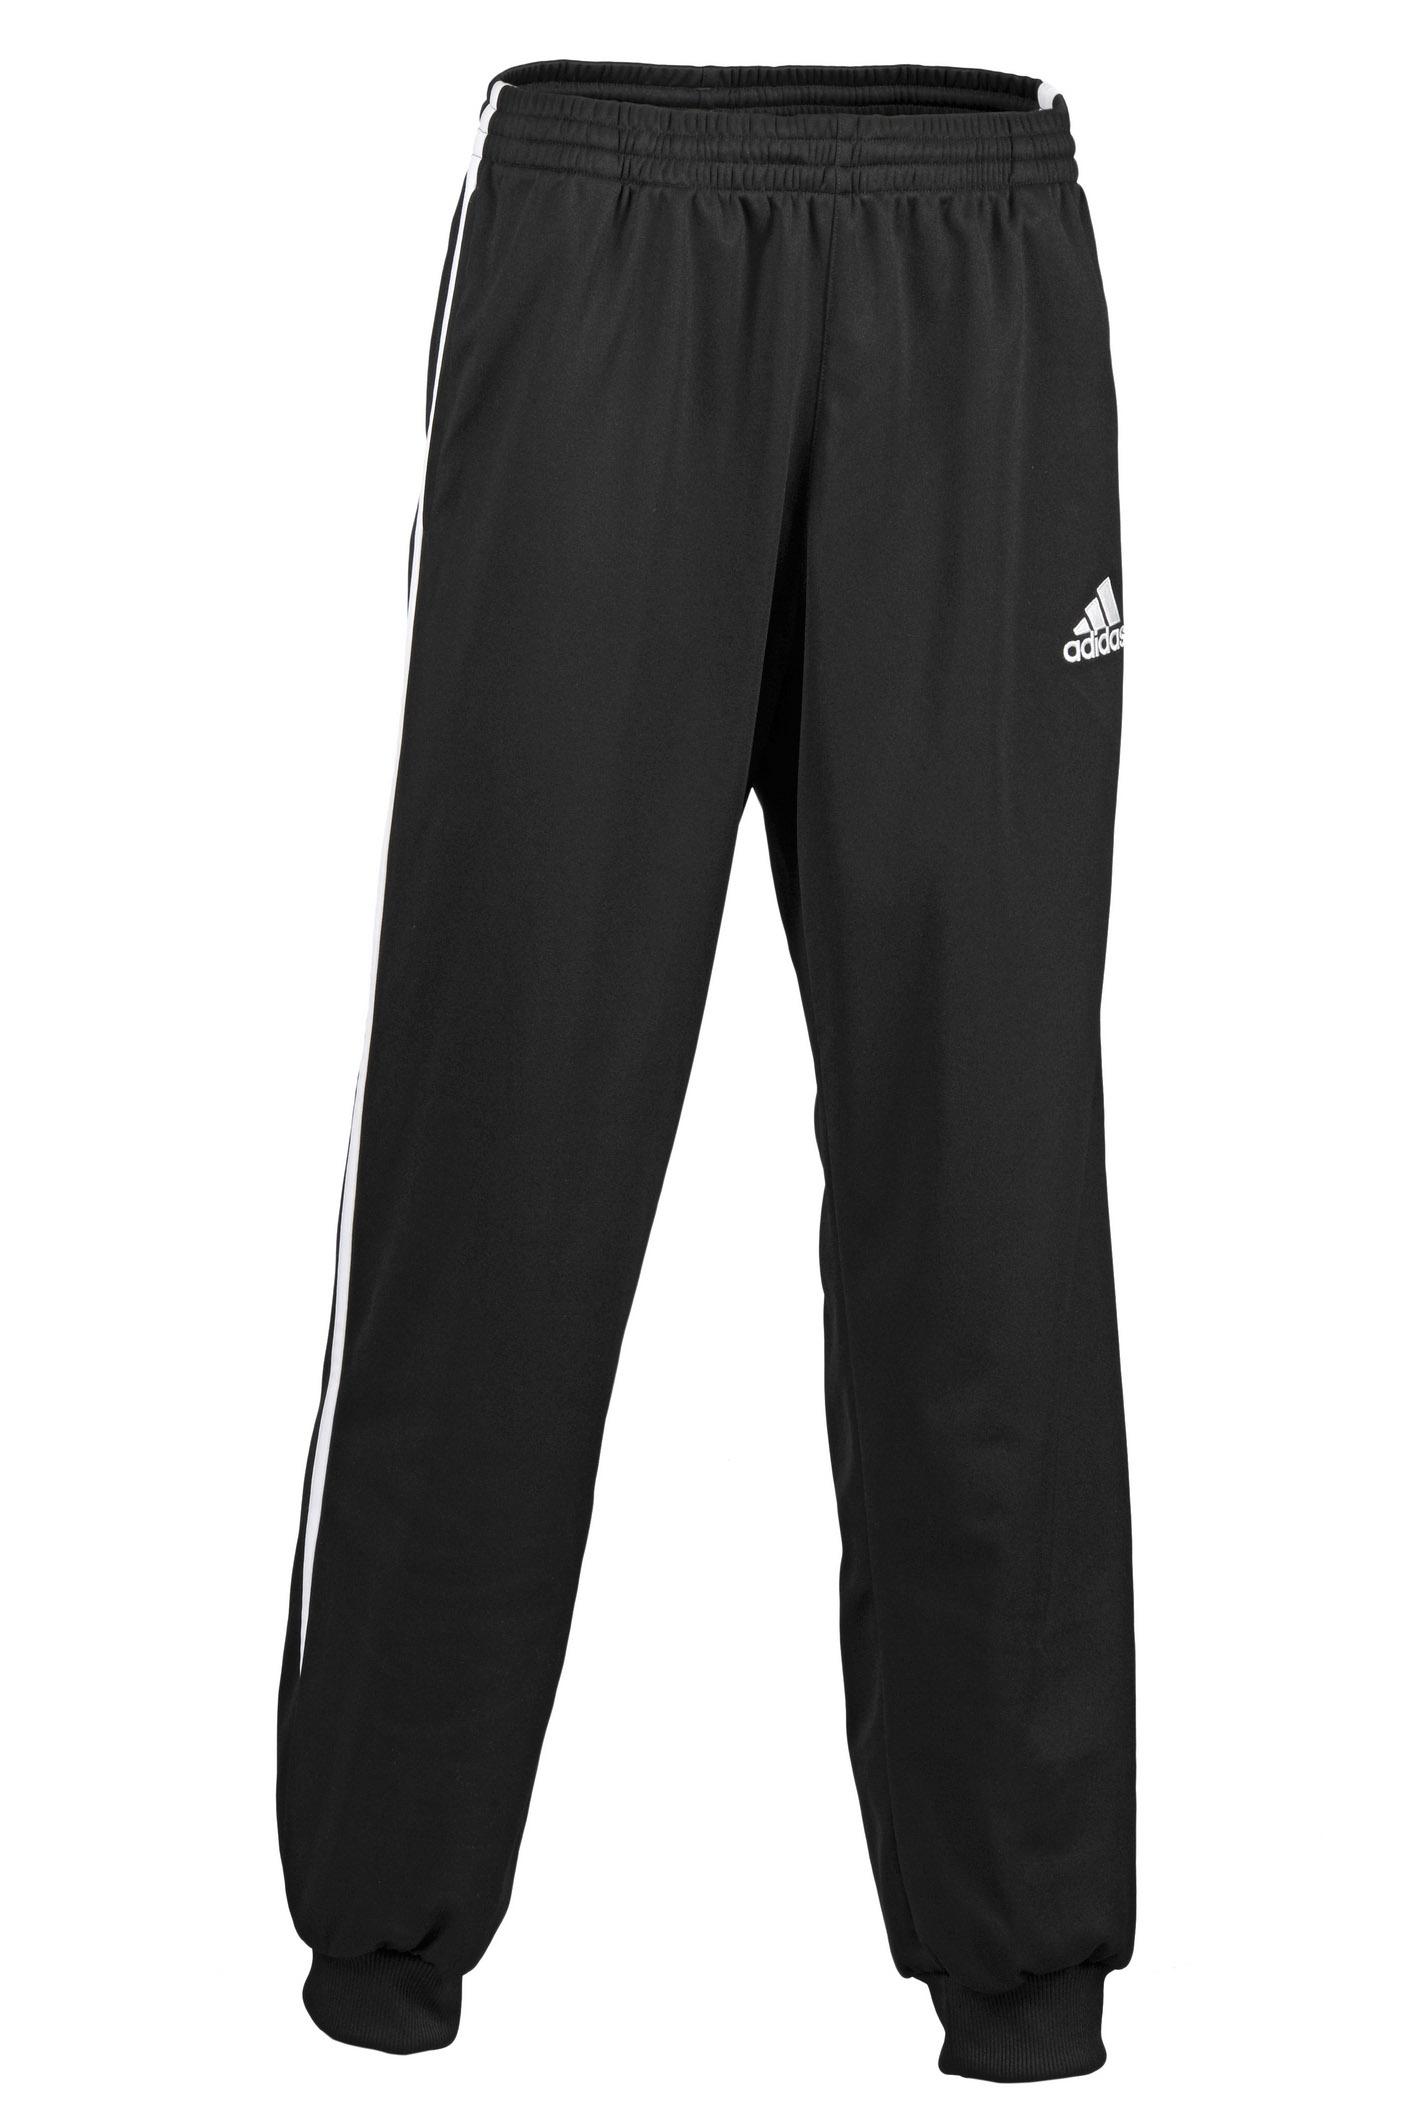 Adidas Seite 3 SK Teamsport:Sportbekleidung,adidas